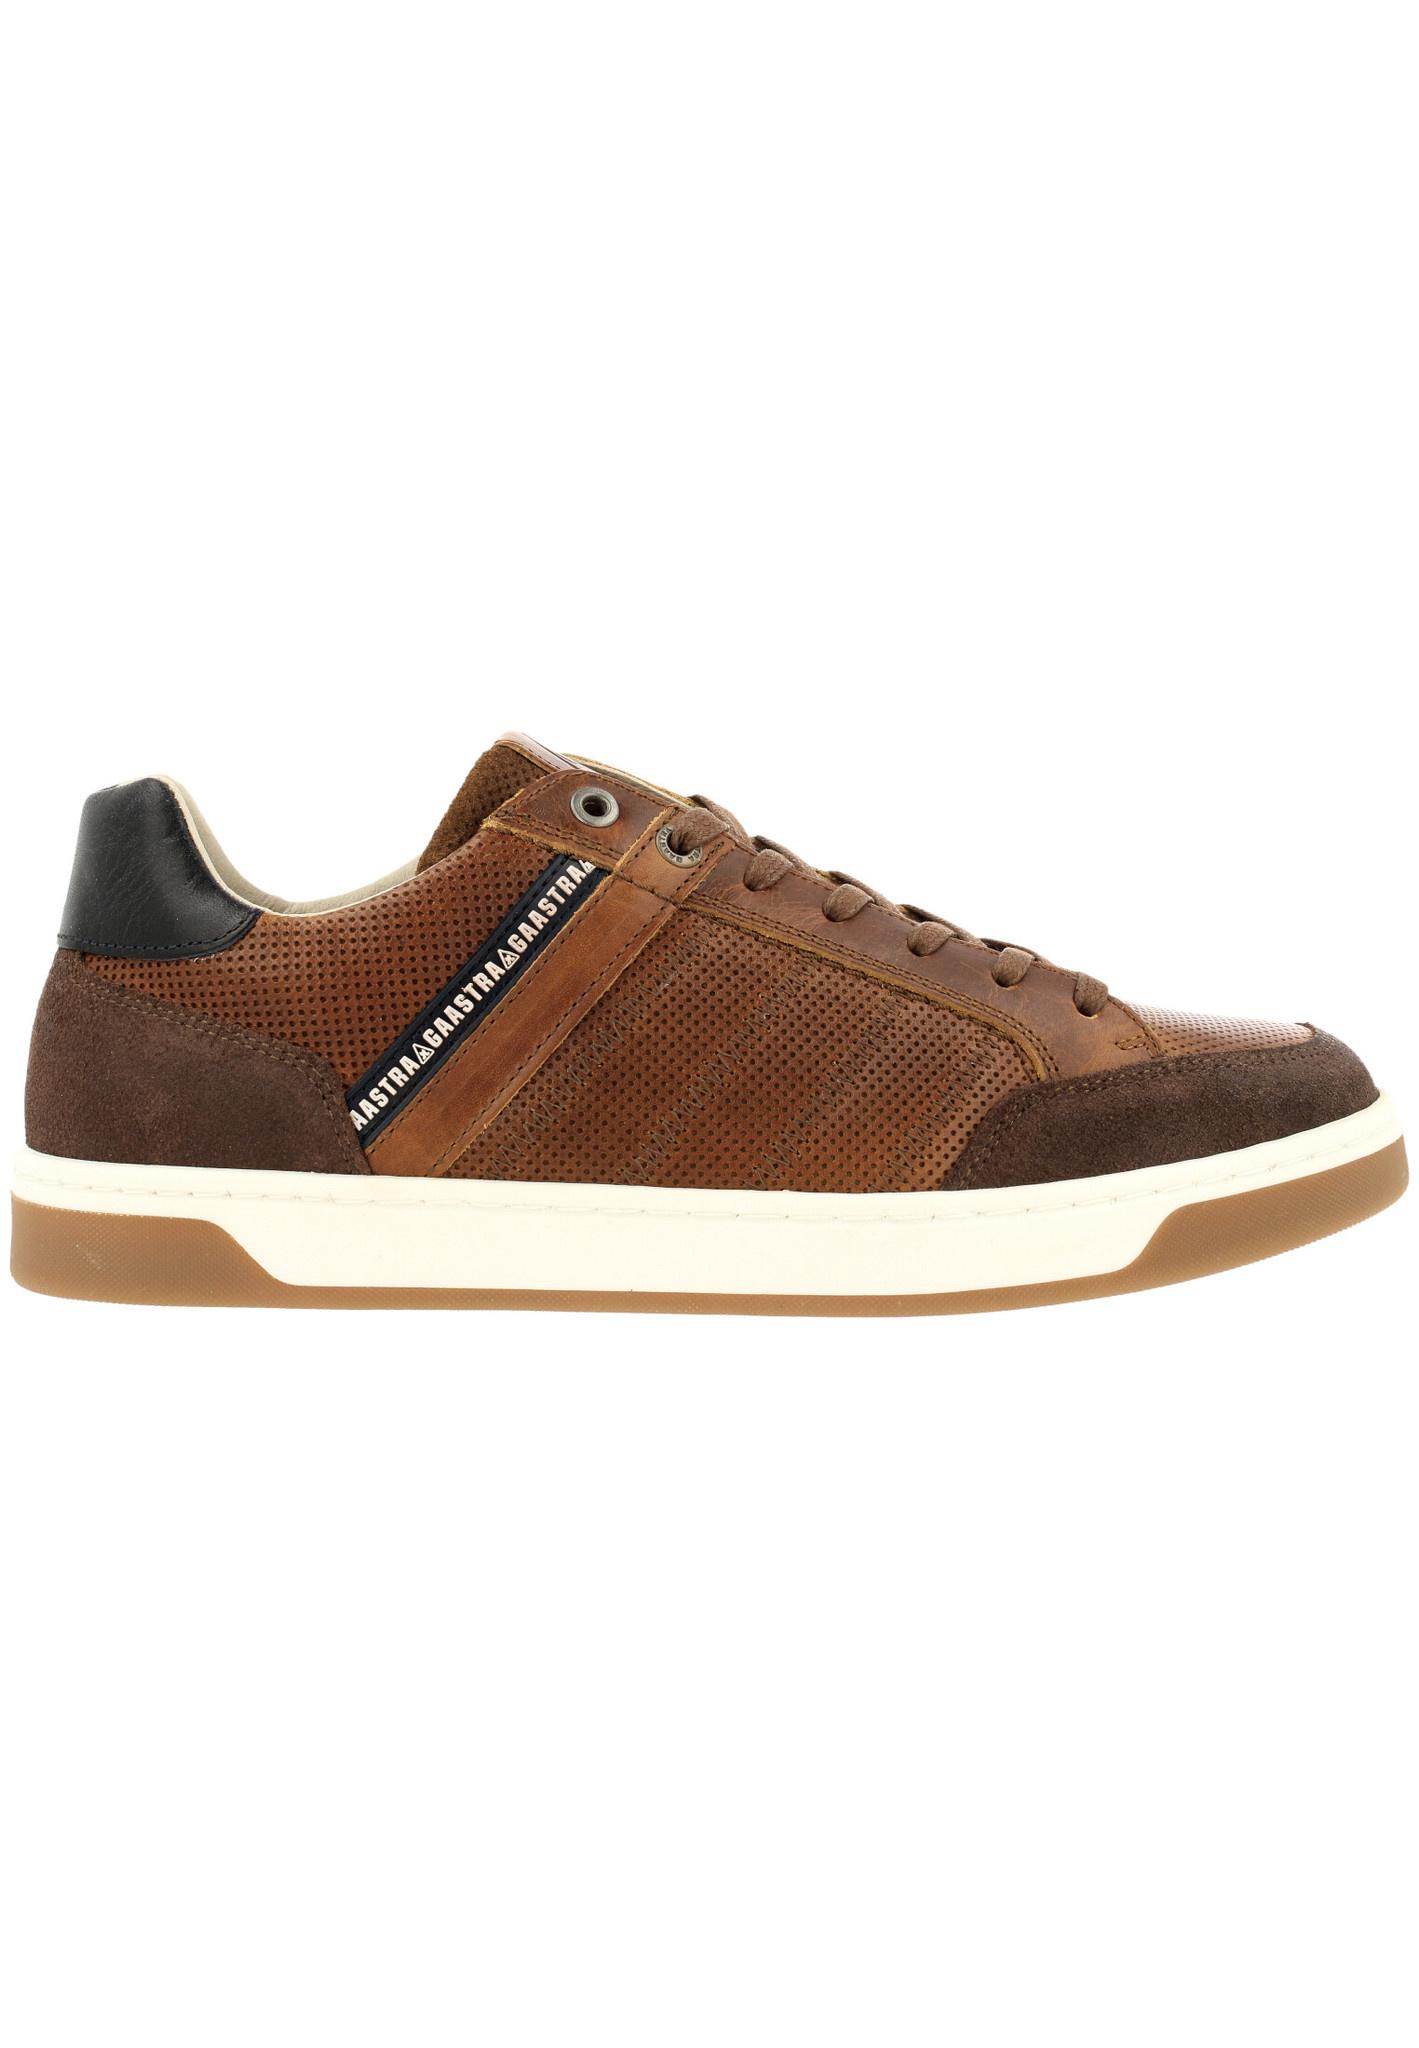 Sneakers WALLACE PRF - cognac